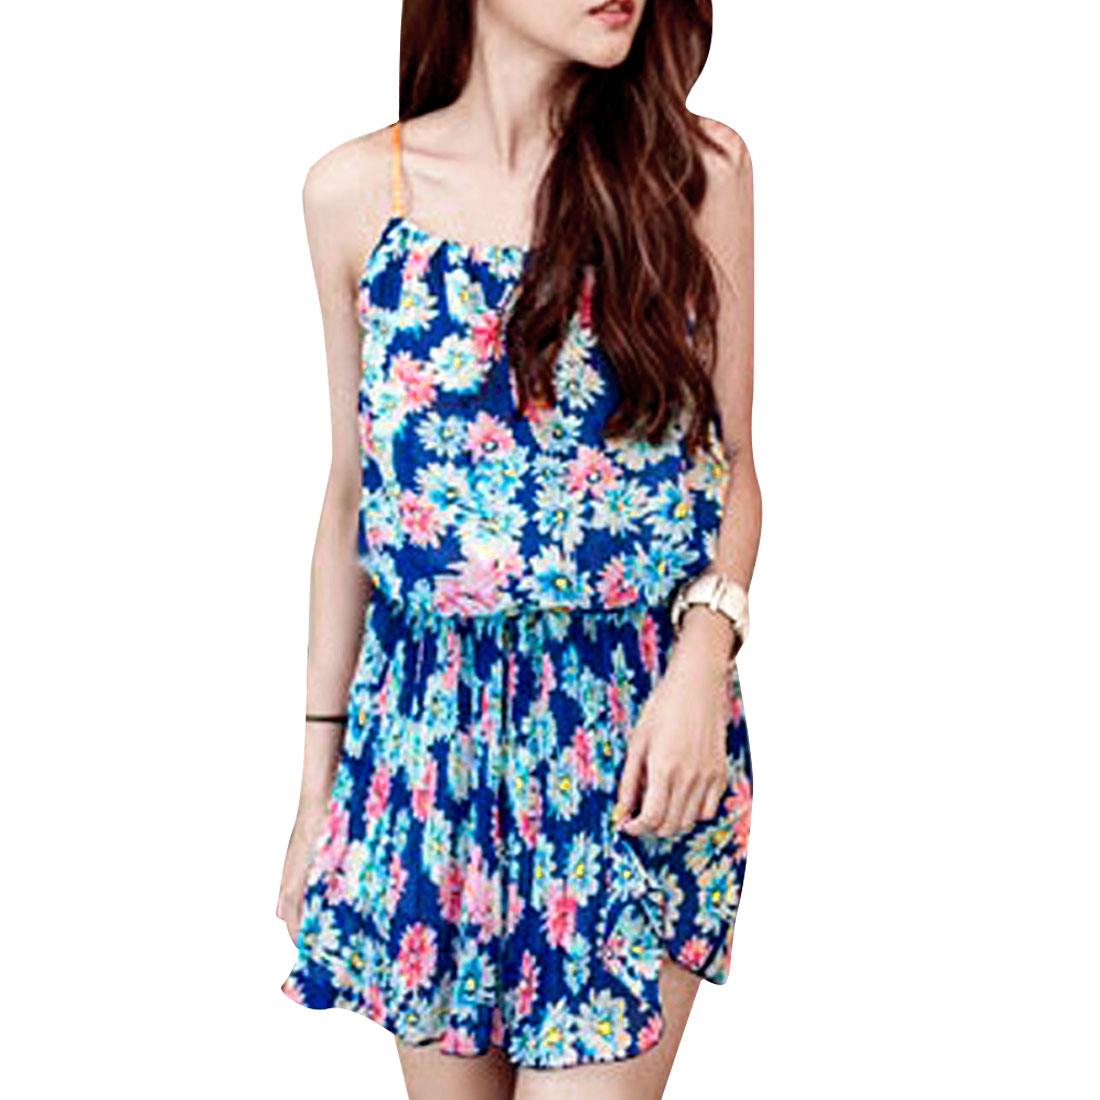 Lady Blue Flower Design Weaved Strap Chiffon Dress XS